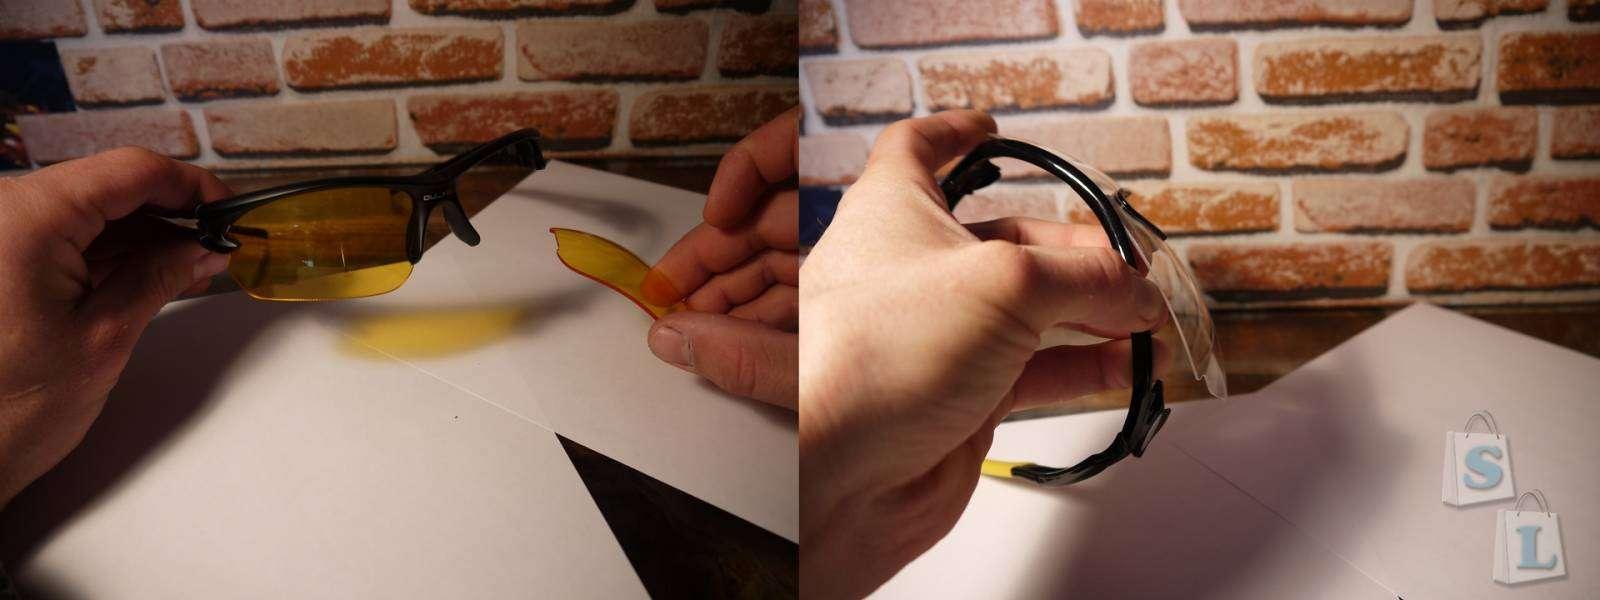 Aliexpress: Очки защитные (вело, мото, очки).